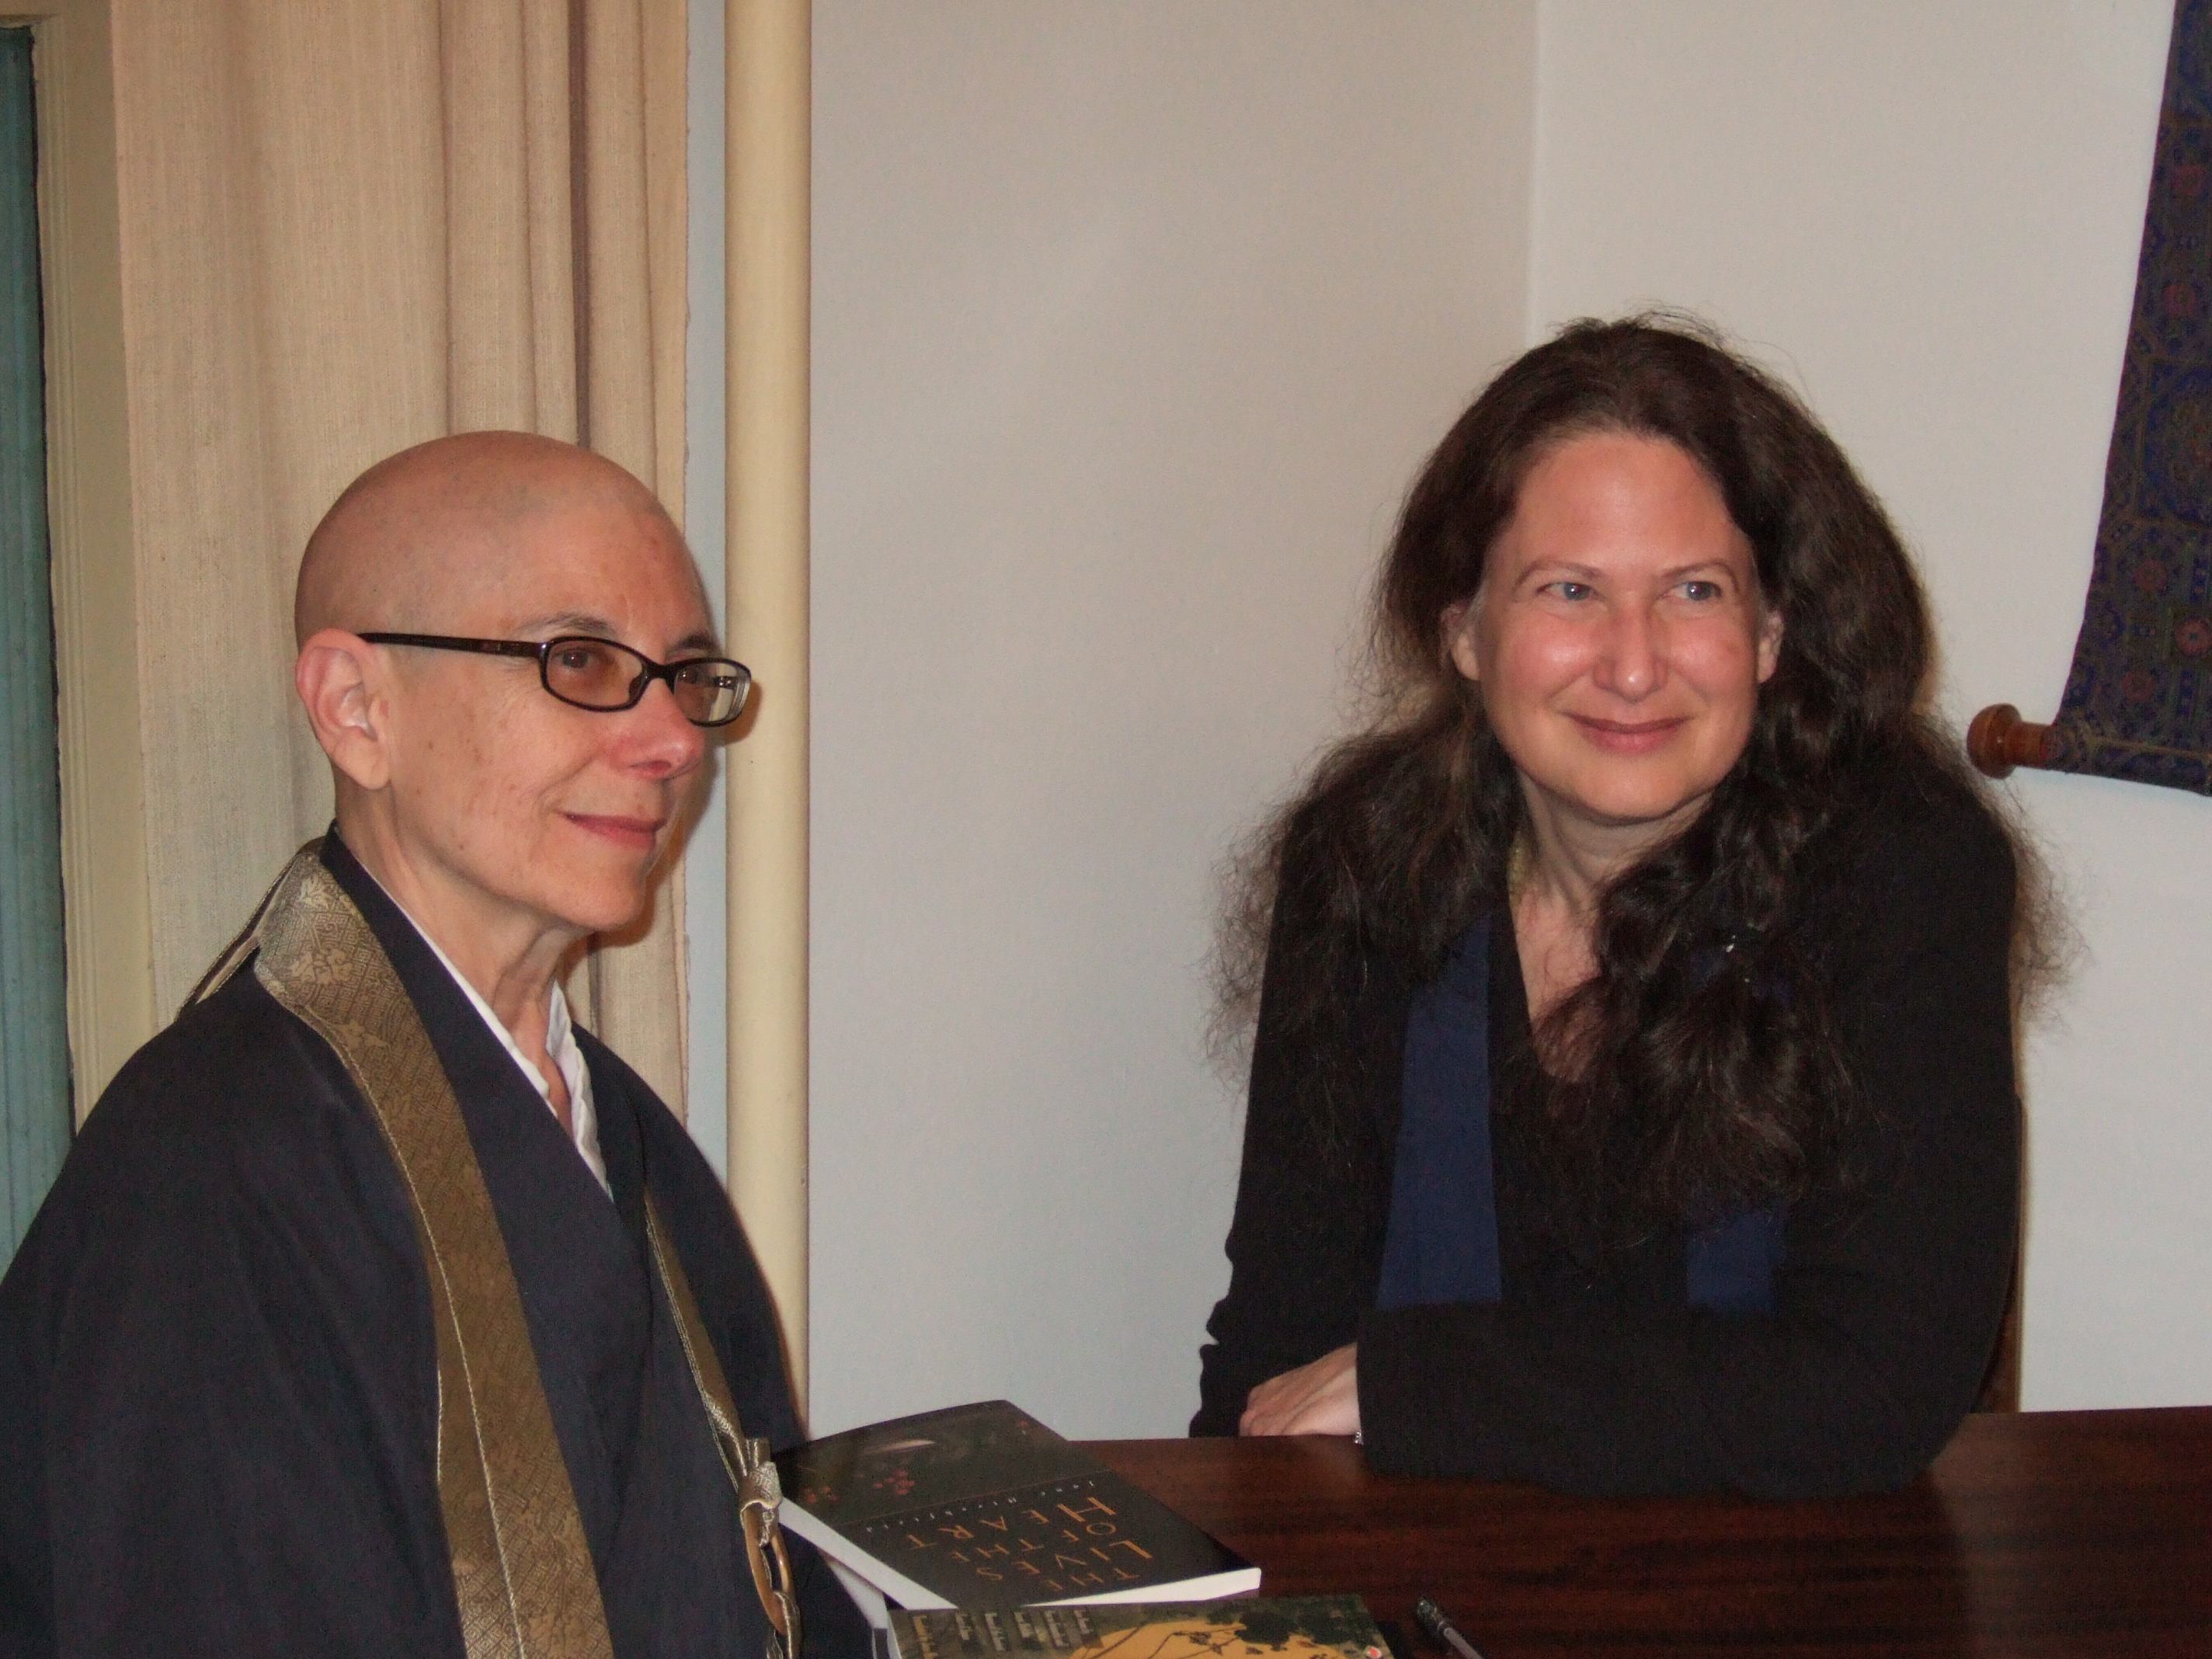 Roko Shinge Roshi and Jane Hirshfield